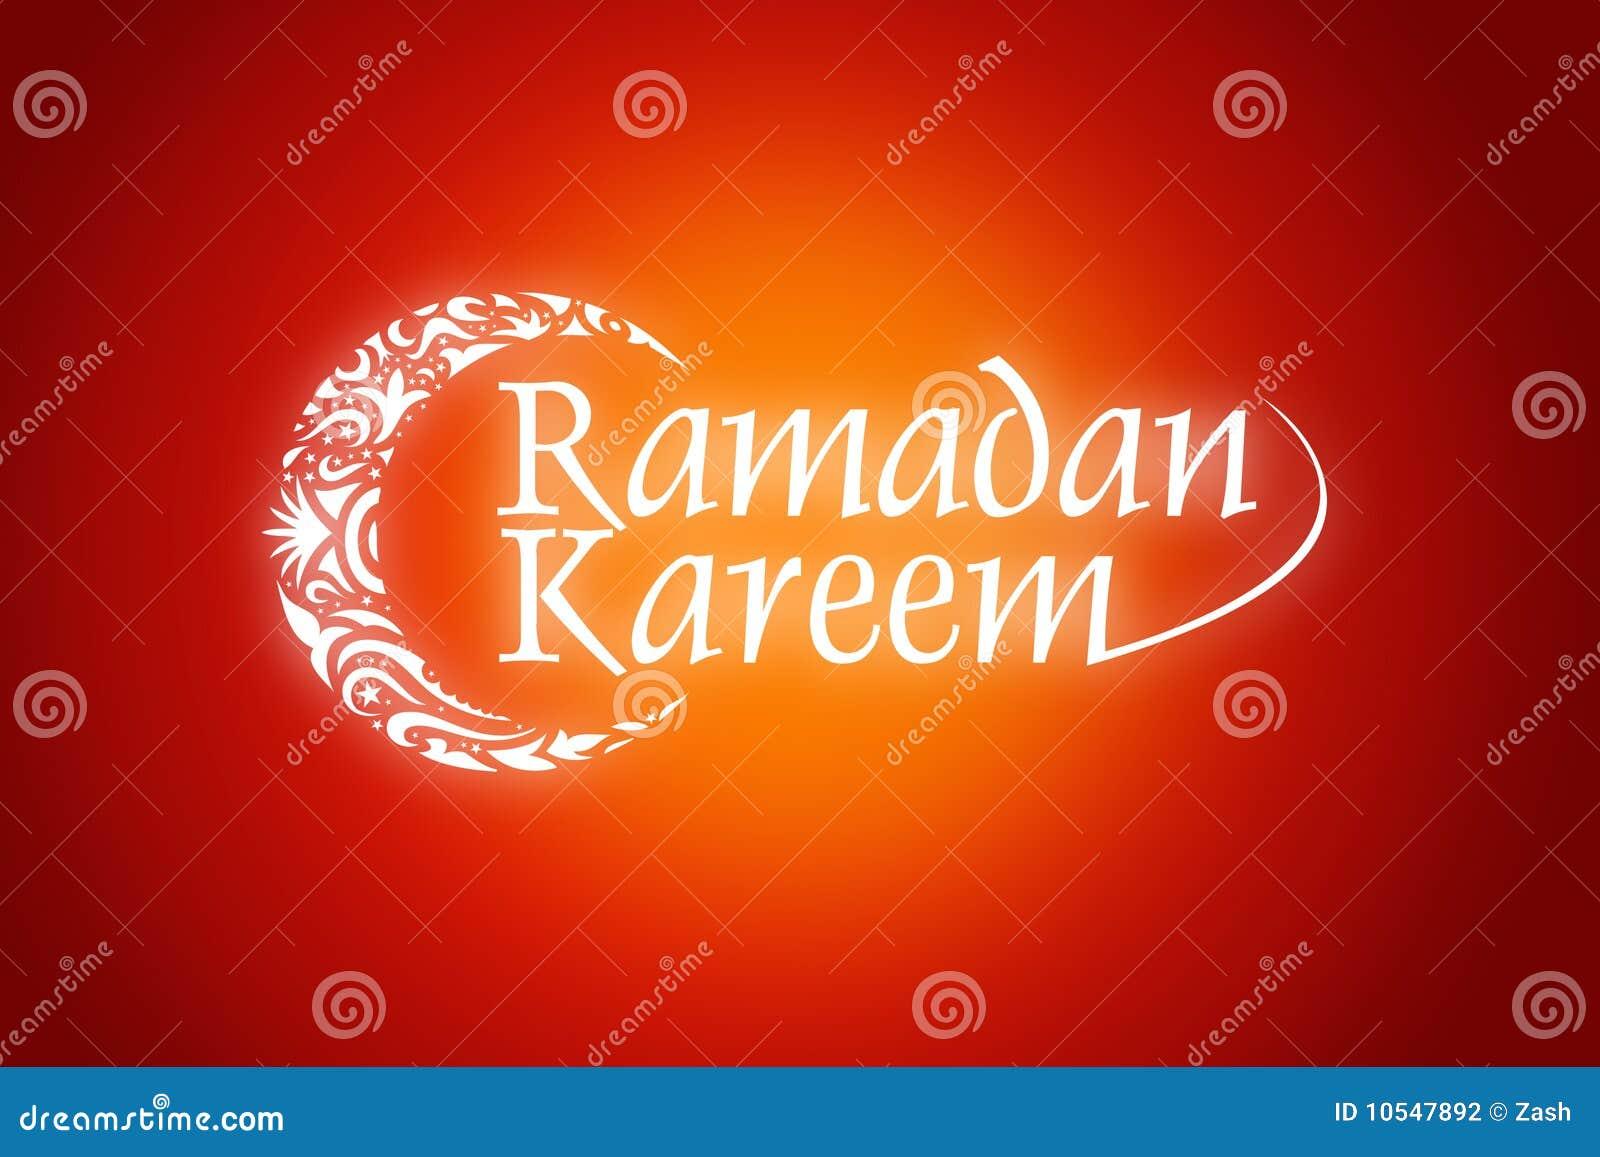 http://thumbs.dreamstime.com/z/ramadan-kareem-poster-10547892.jpg